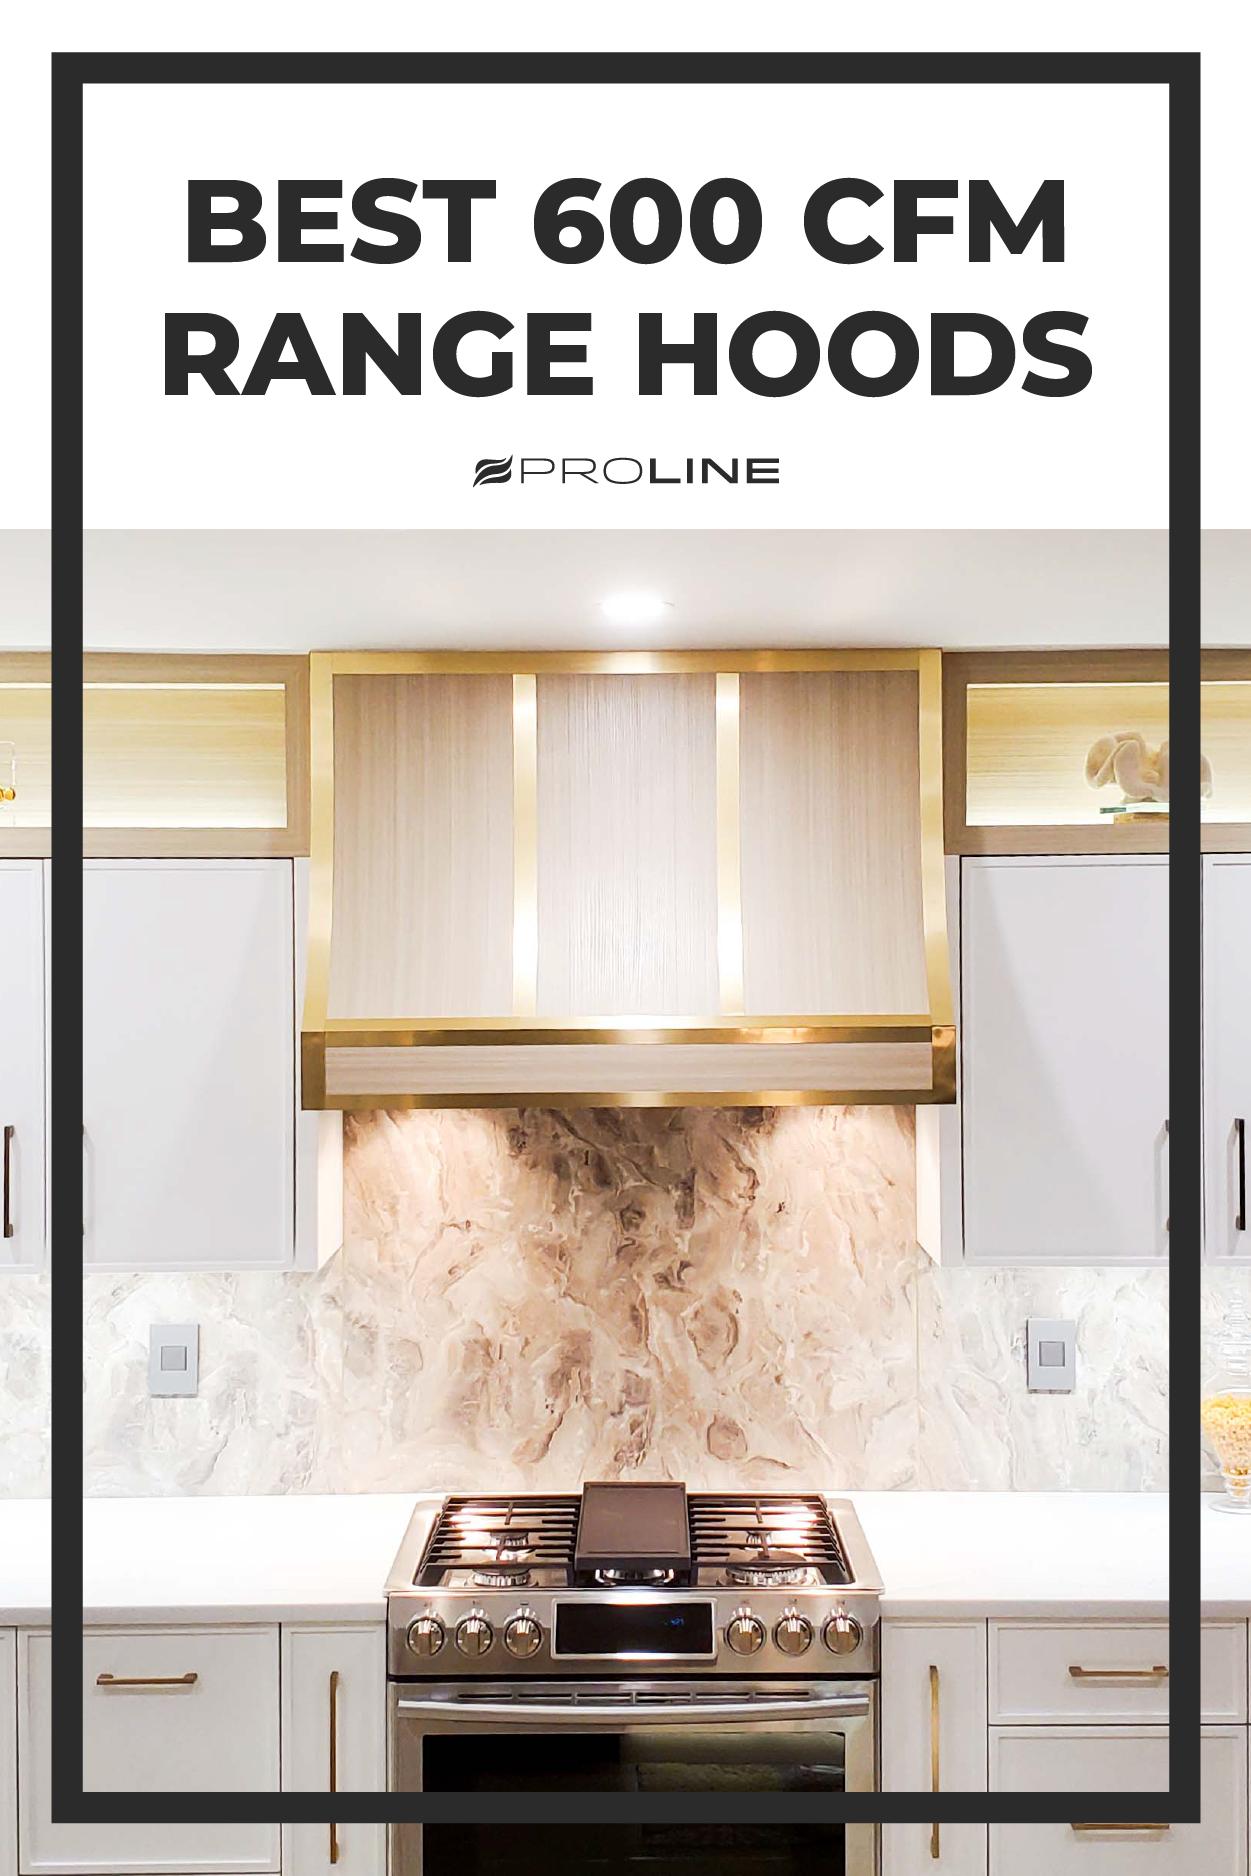 Best 600 Cfm Range Hoods And Buyer S Guide In 2020 Range Hoods Home Remodeling Kitchen Style